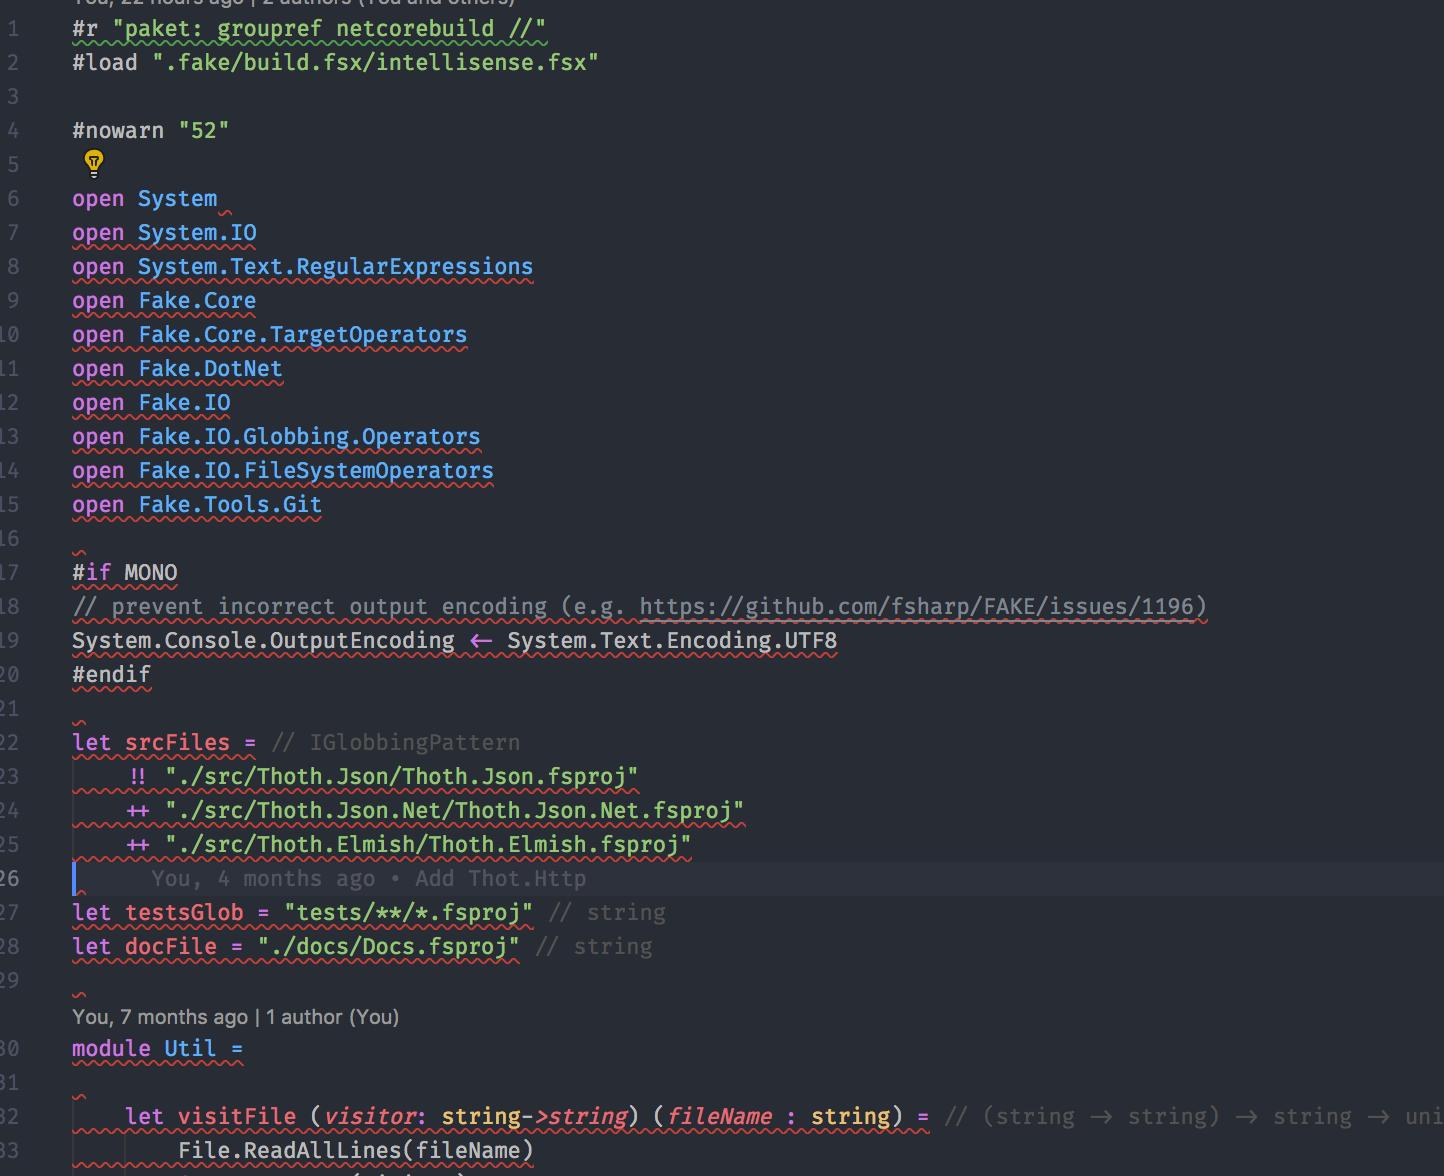 Intellisense error in `build fsx` file · Issue #839 · ionide